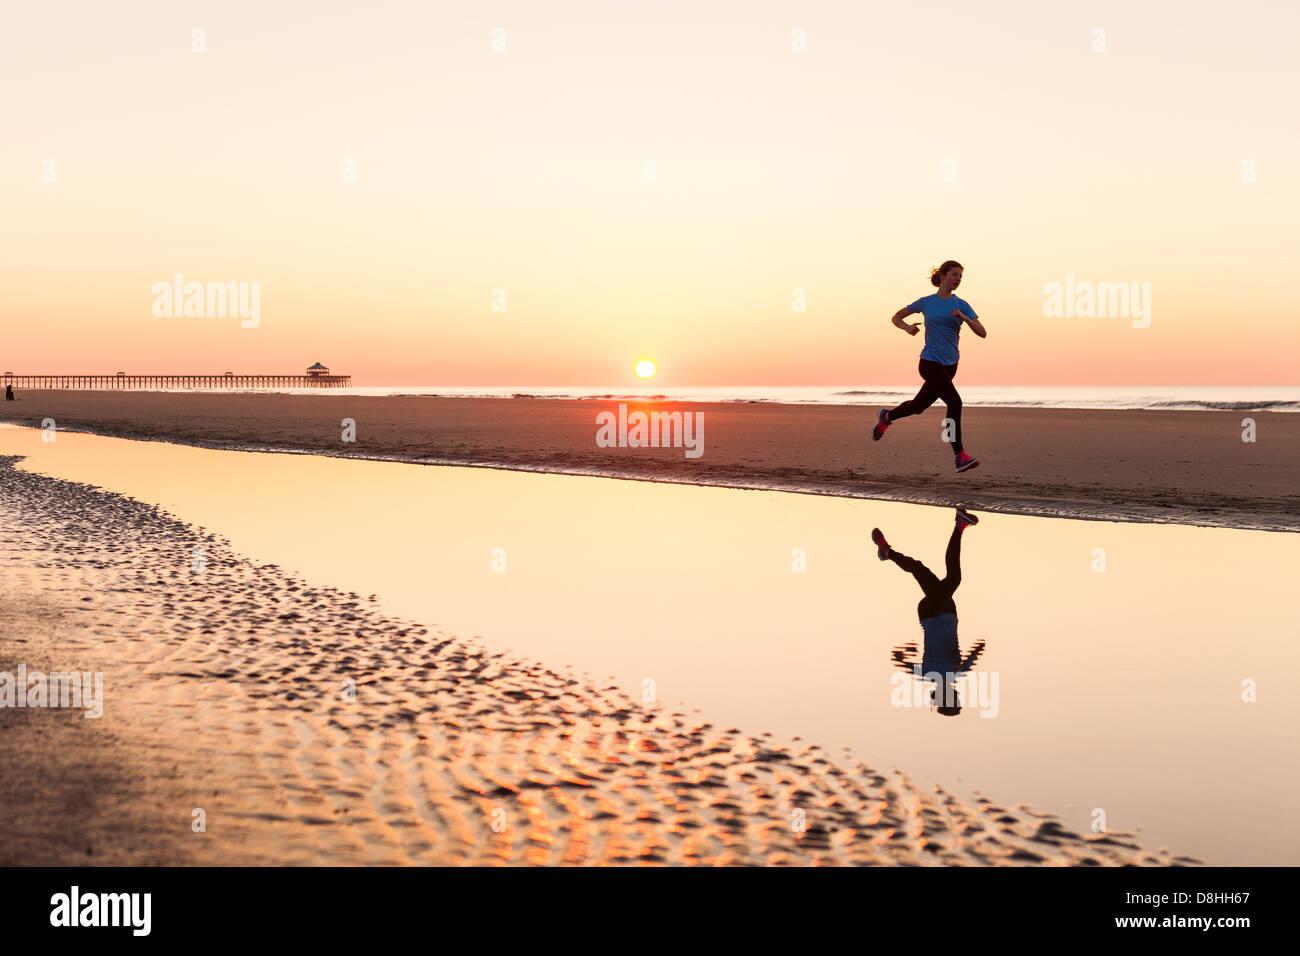 Pareggiatore femmina a beach Immagini Stock